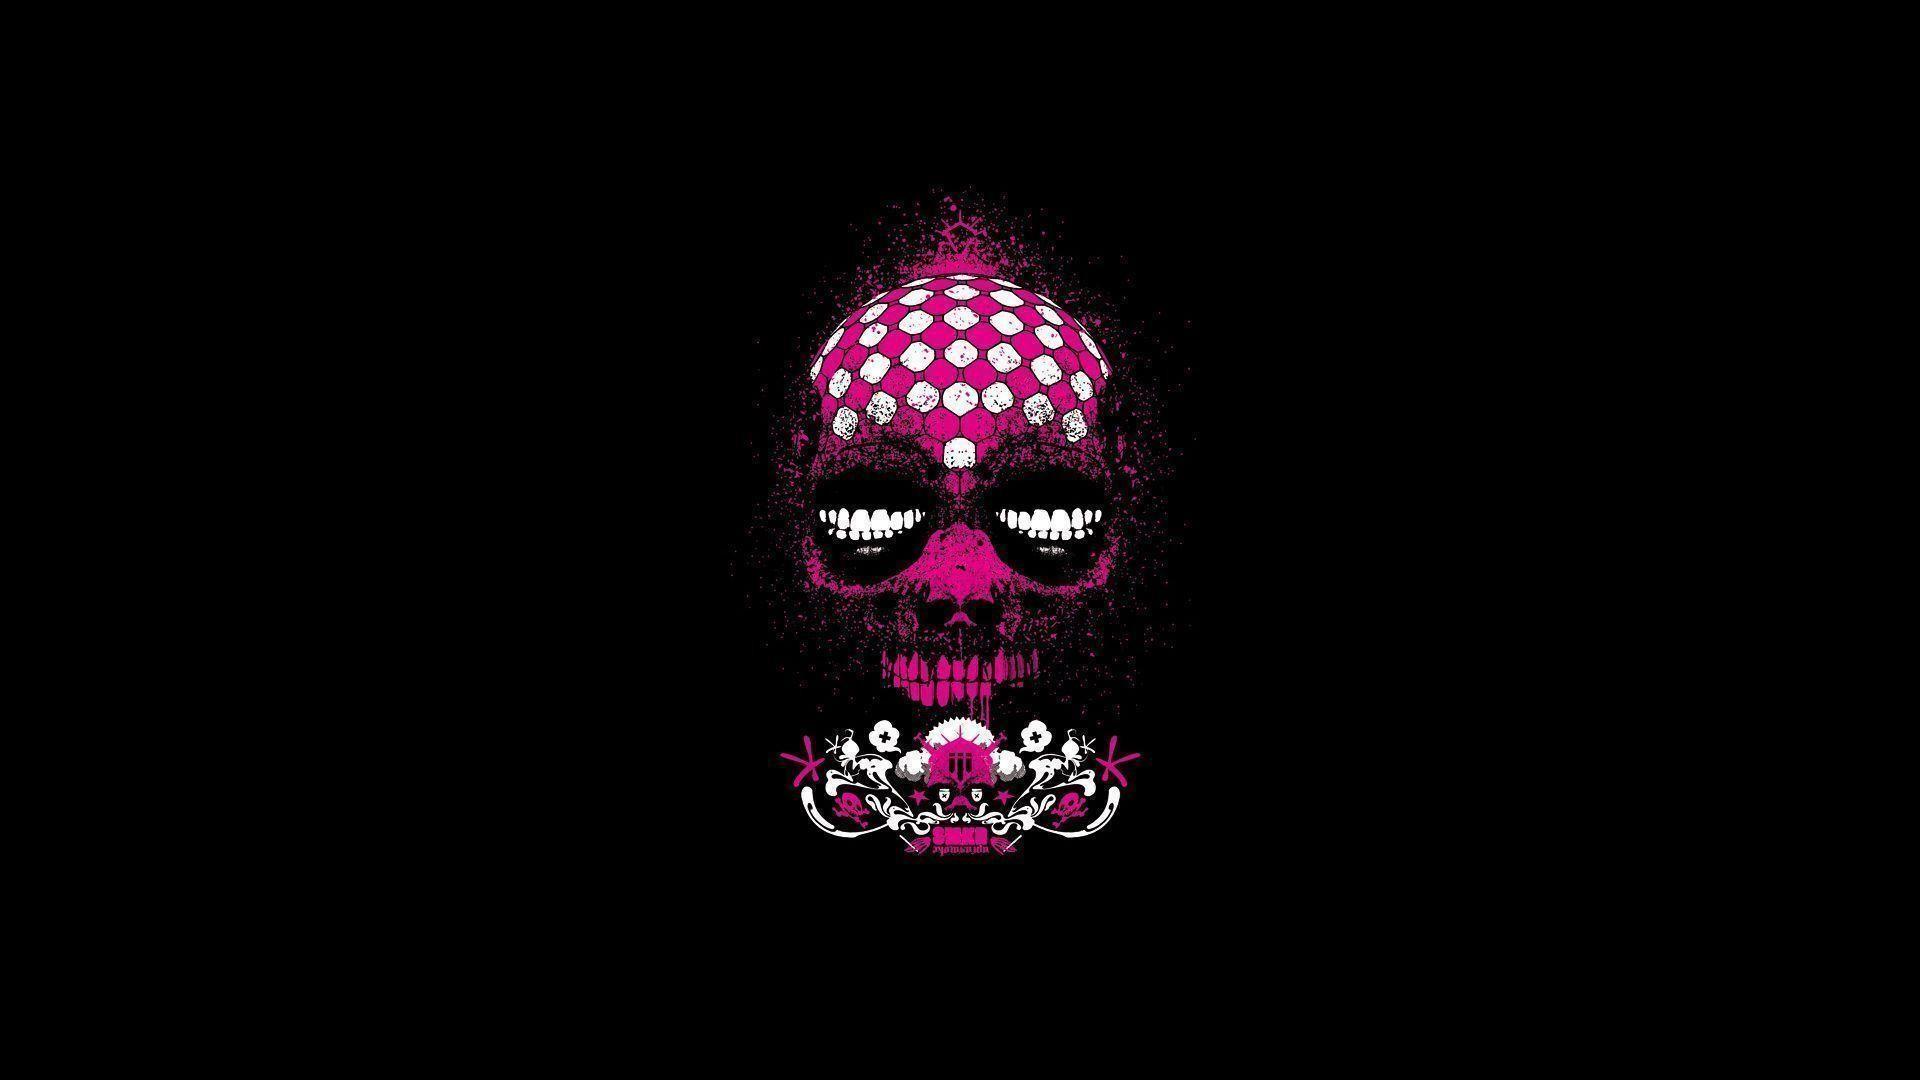 Free Pink Pop Skull Wallpapers, Free Pink Pop Skull HD Wallpapers .